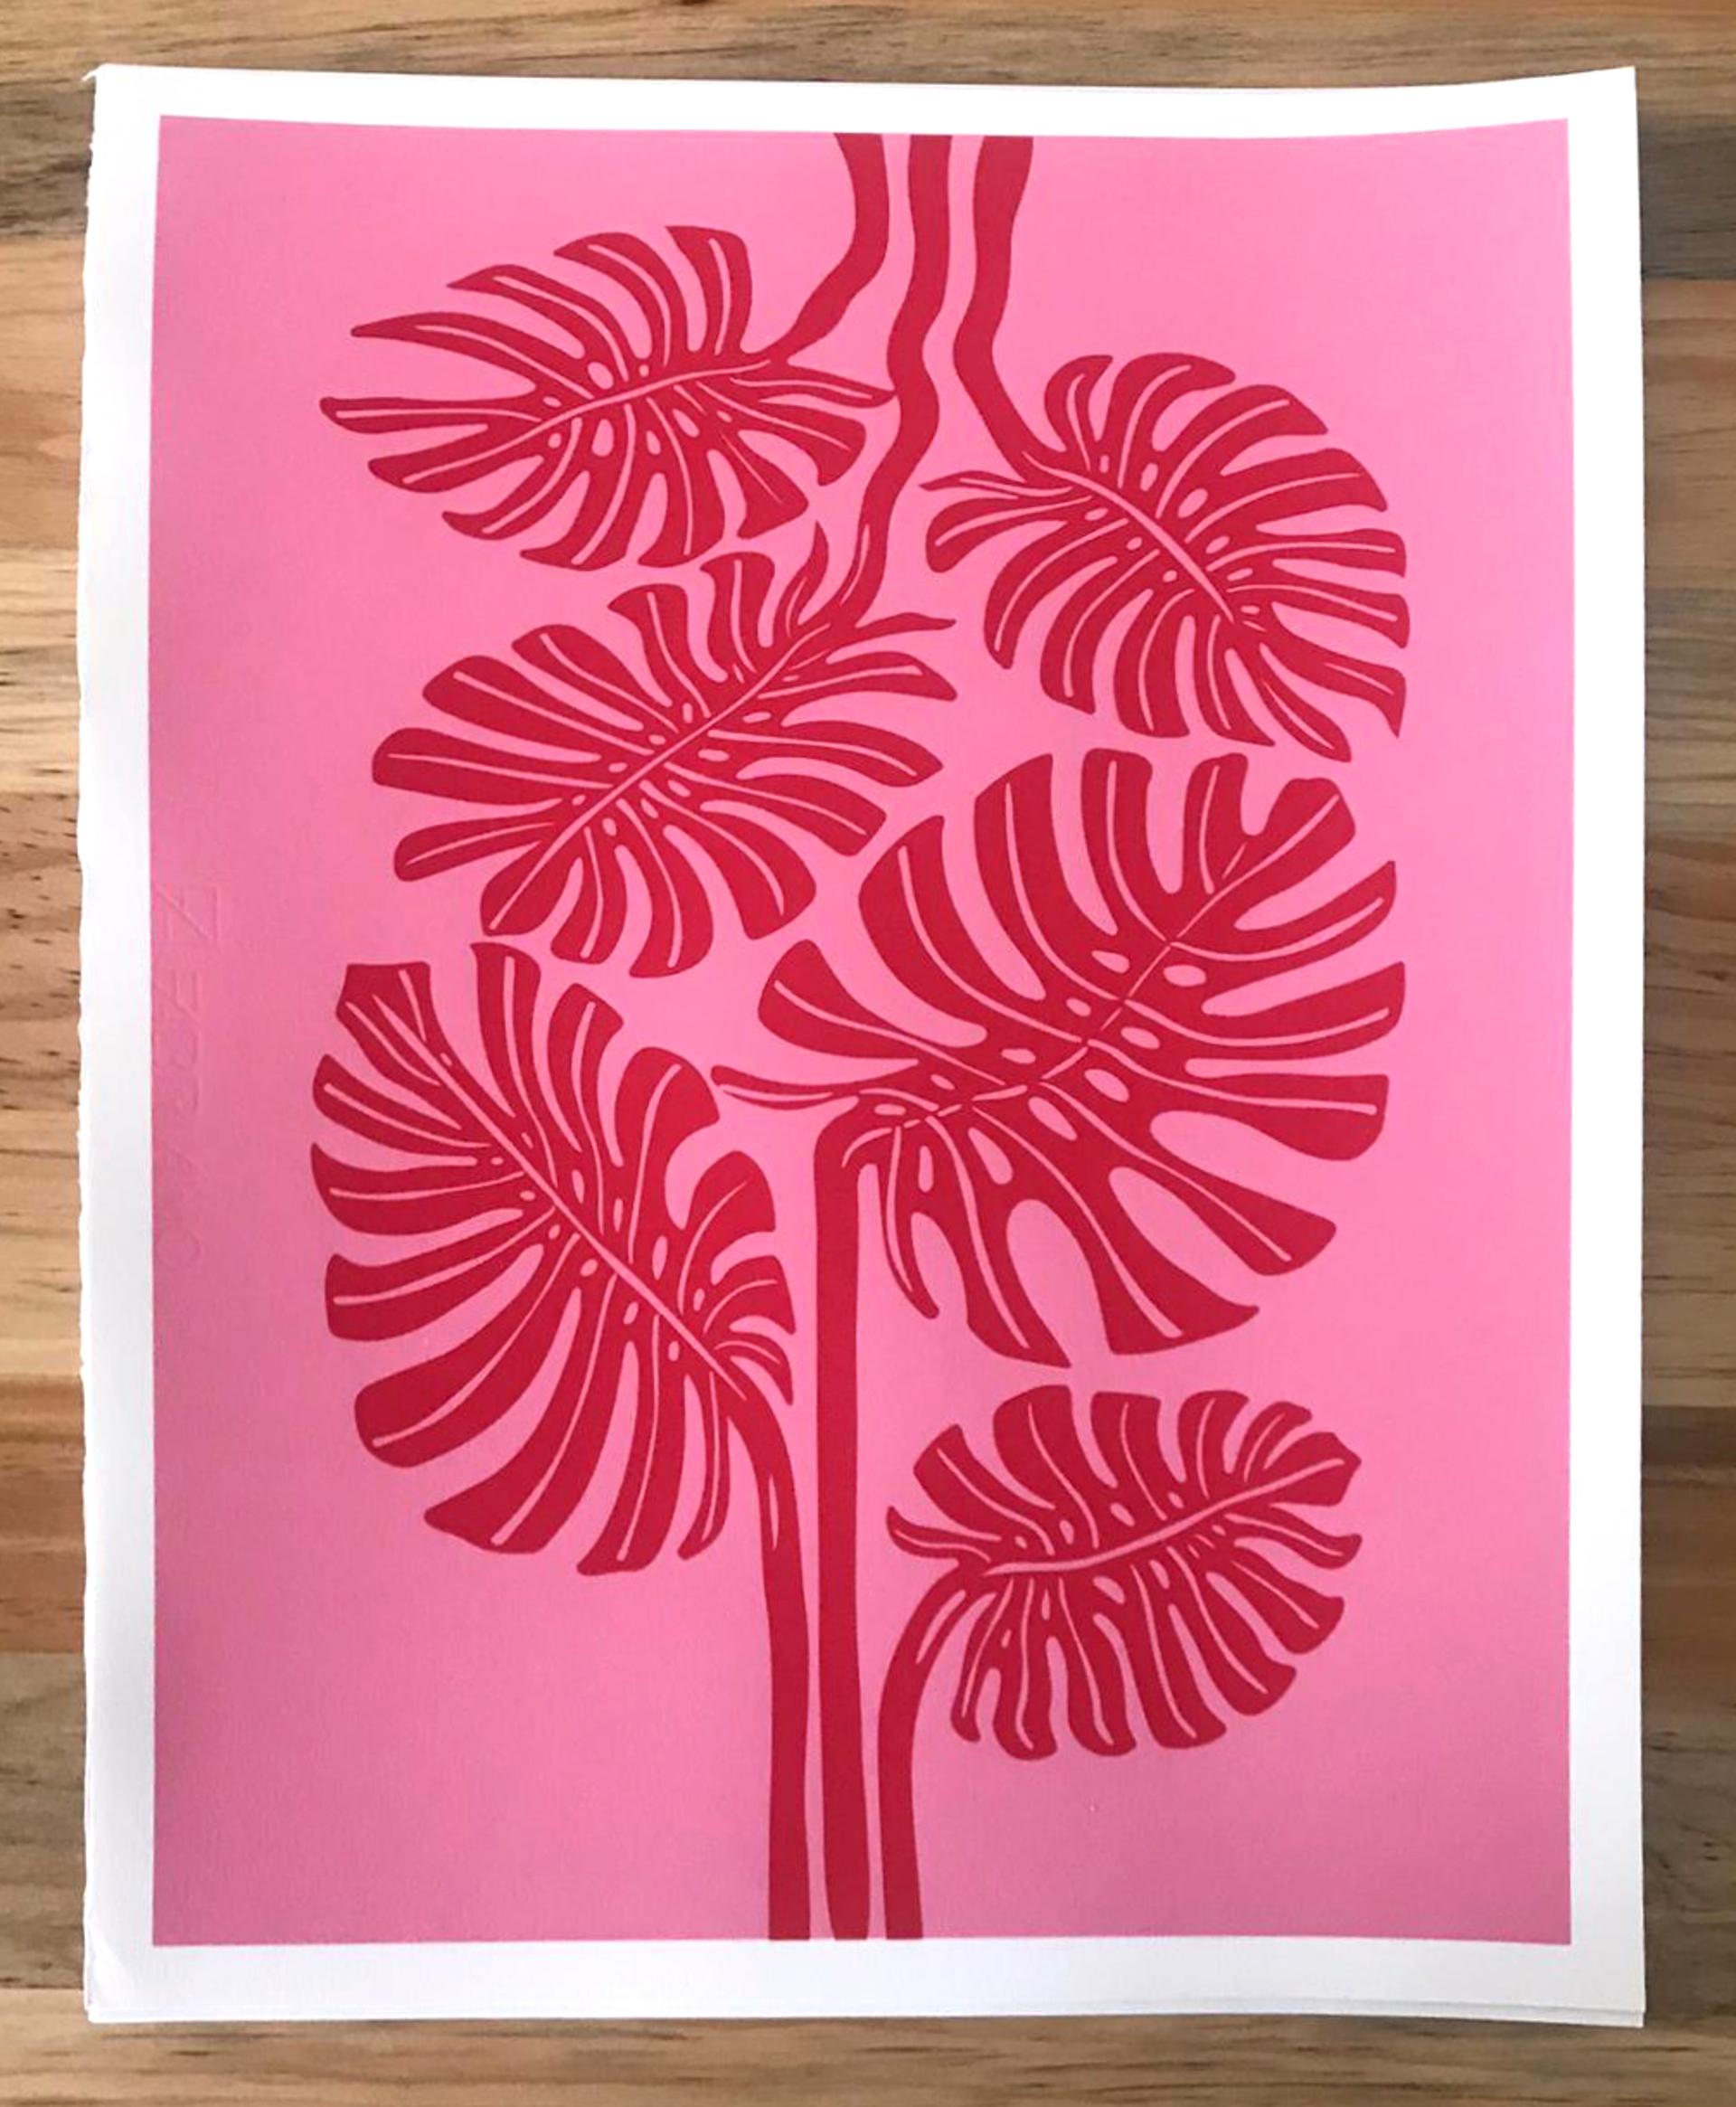 Monstera (Pink/Red) by Mirel Fraga